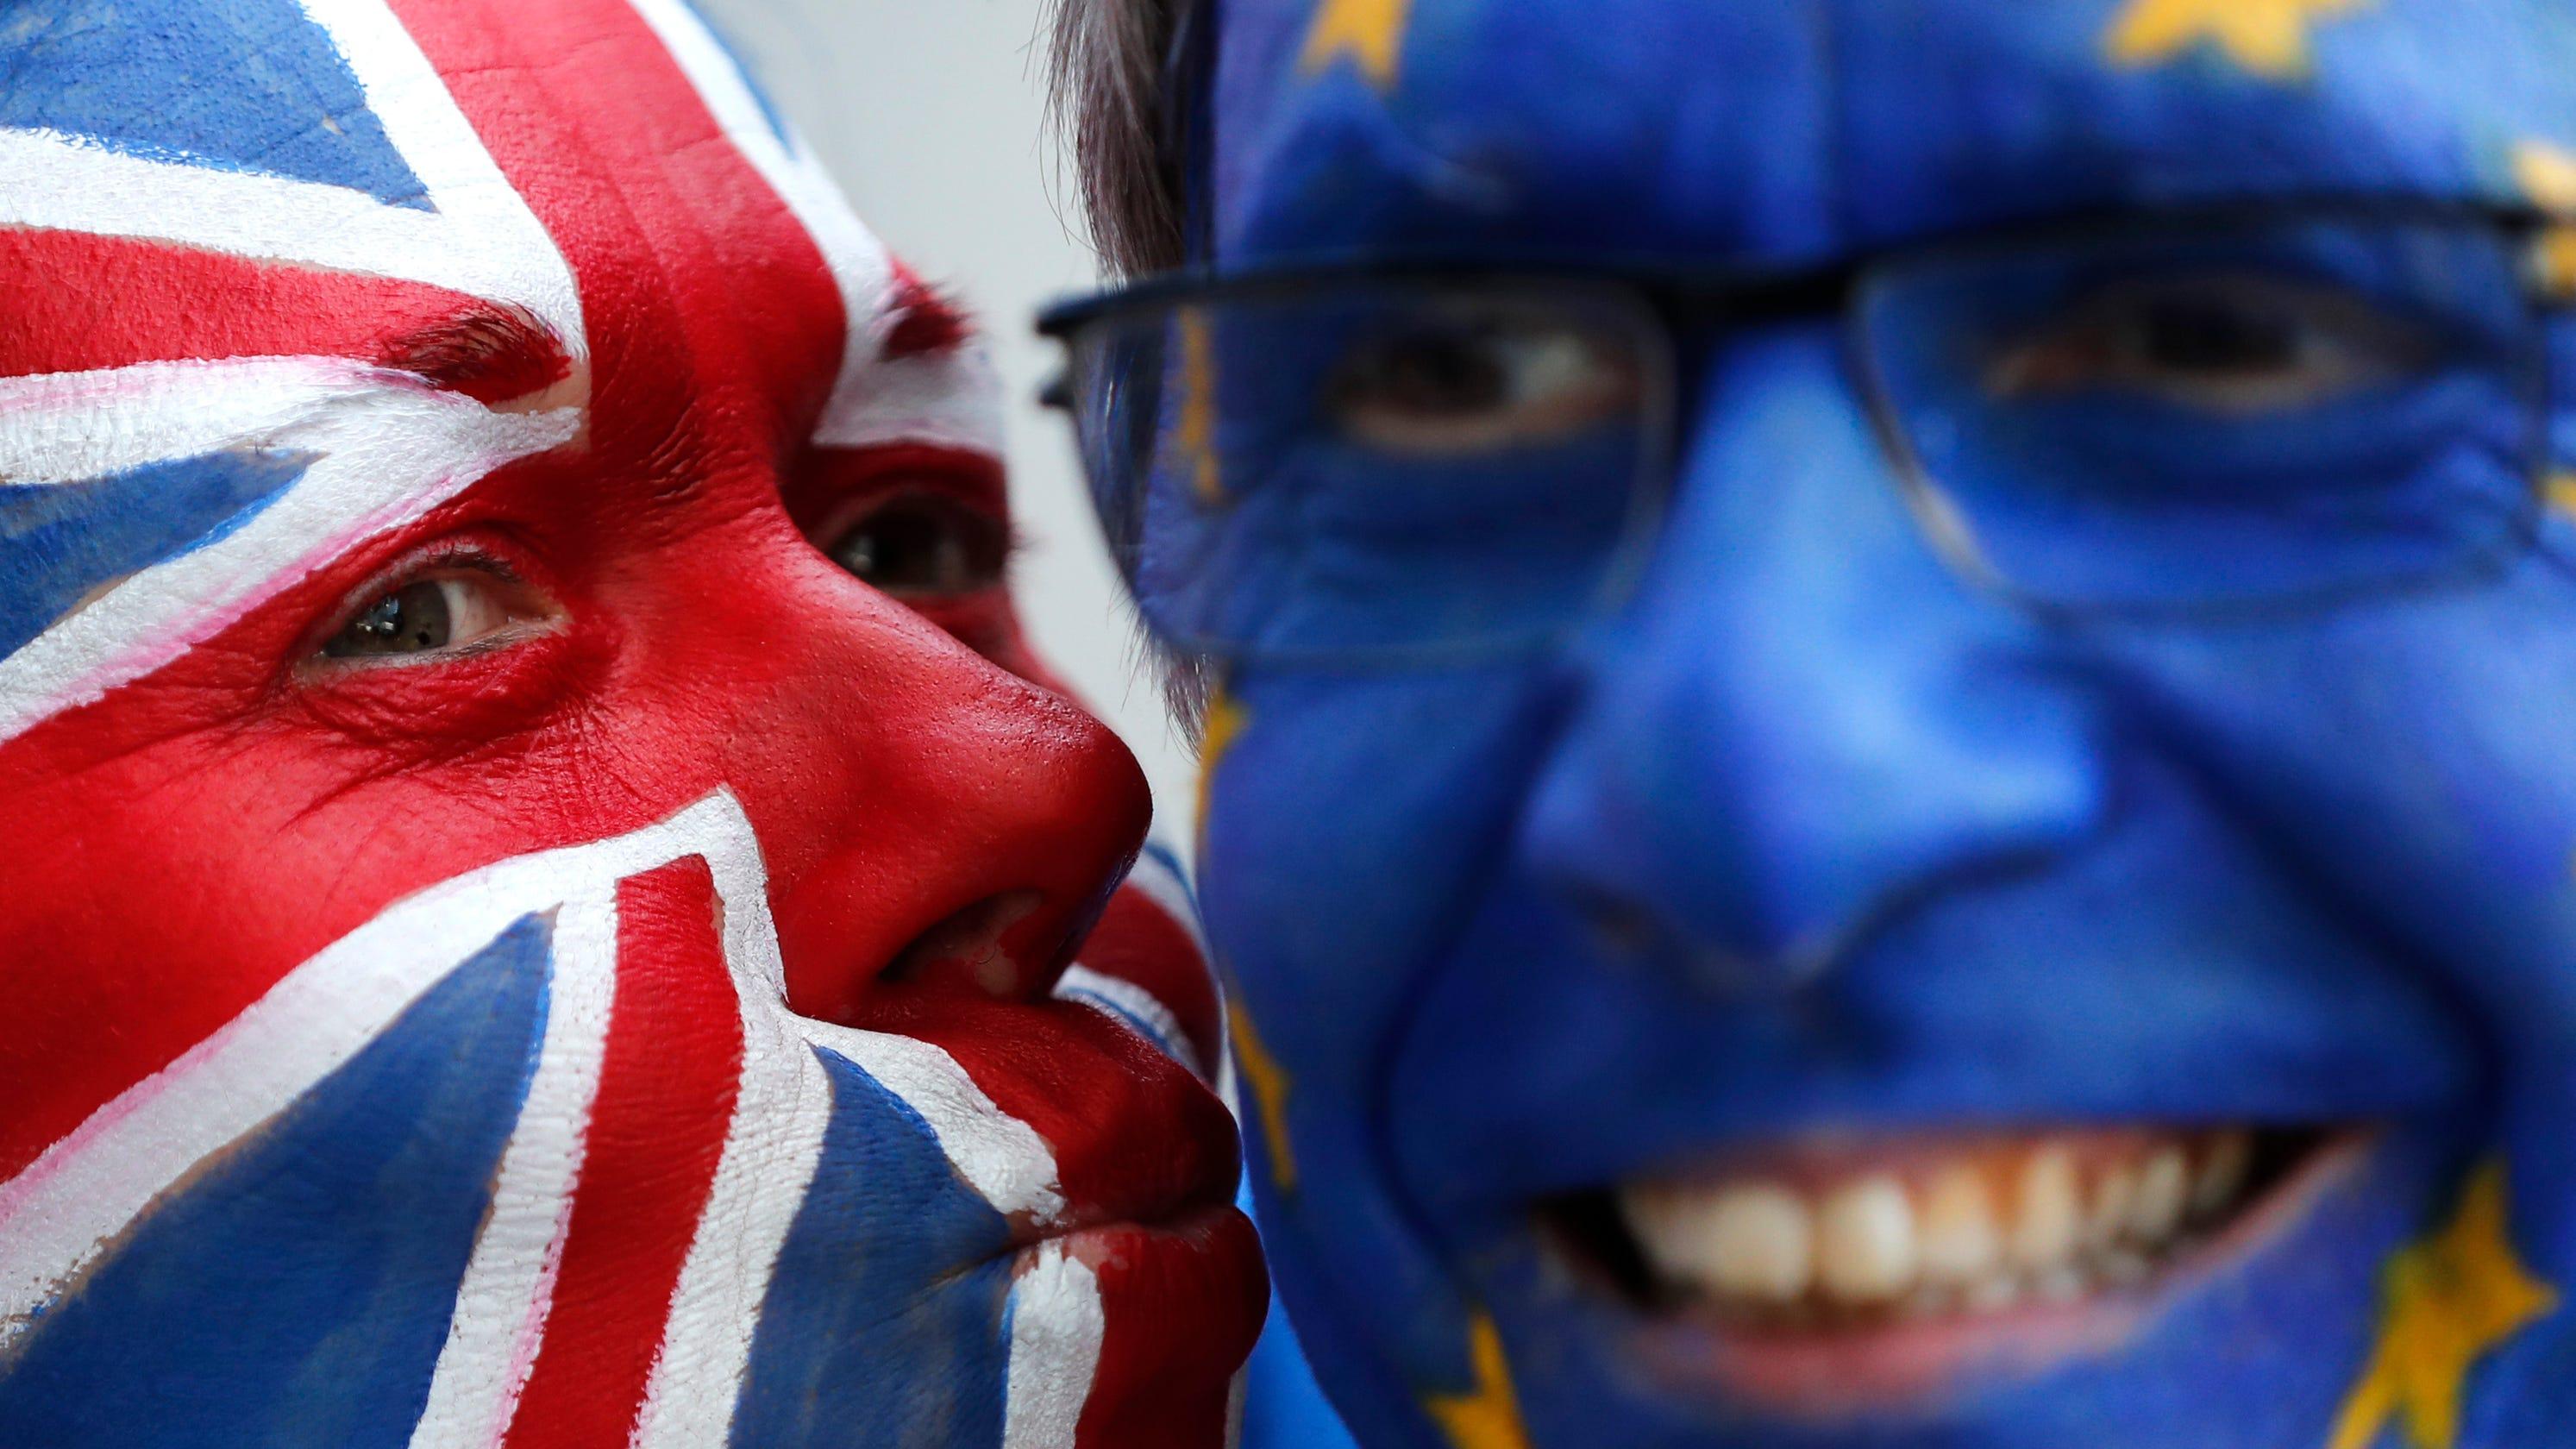 With clock ticking, EU grants Britain Brexit delay